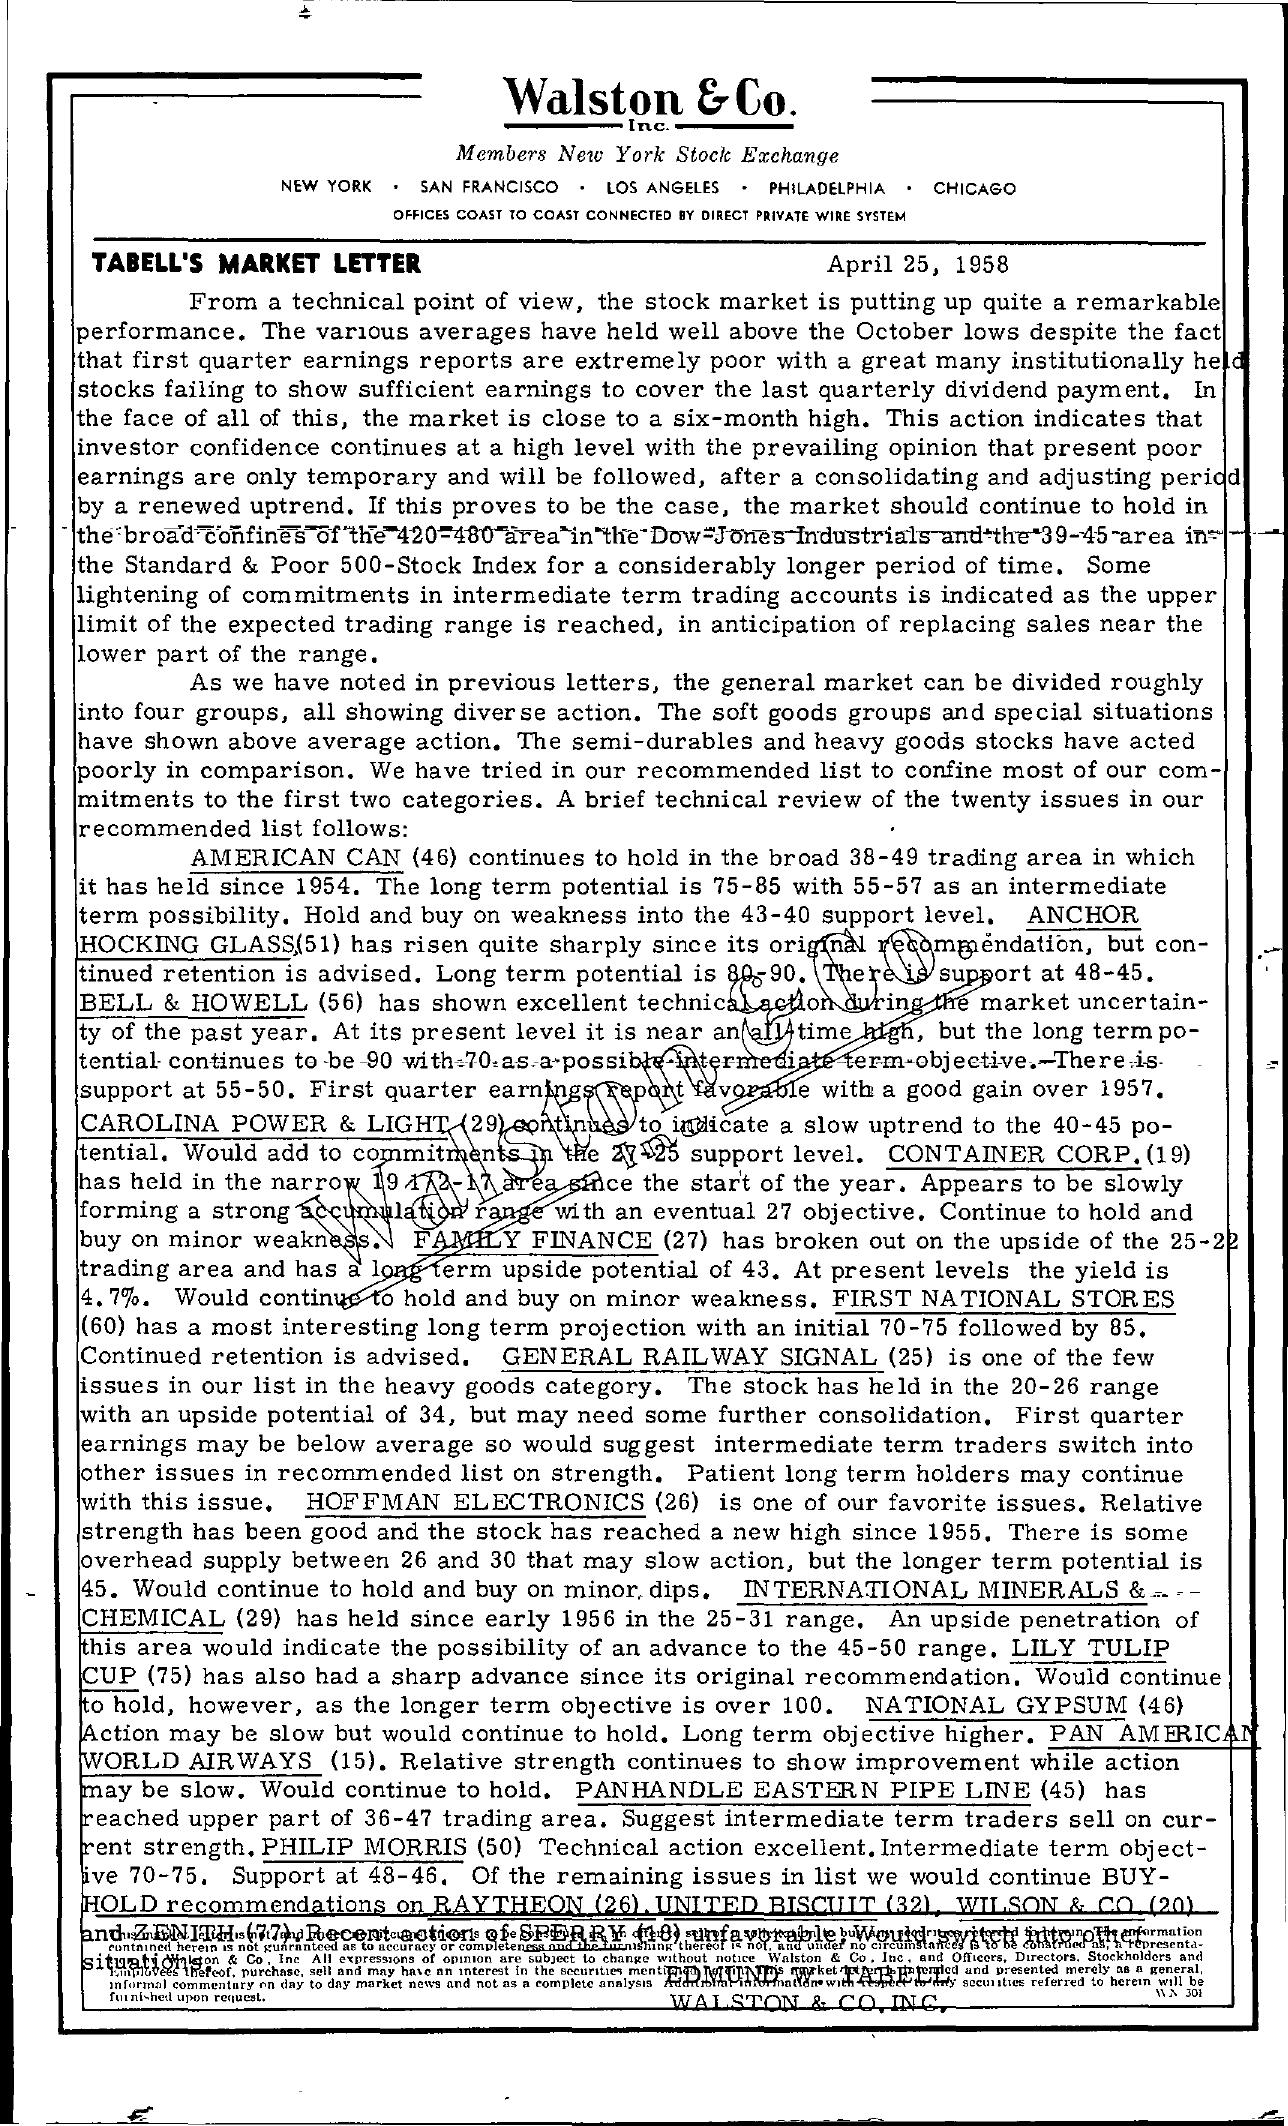 Tabell's Market Letter - April 25, 1958